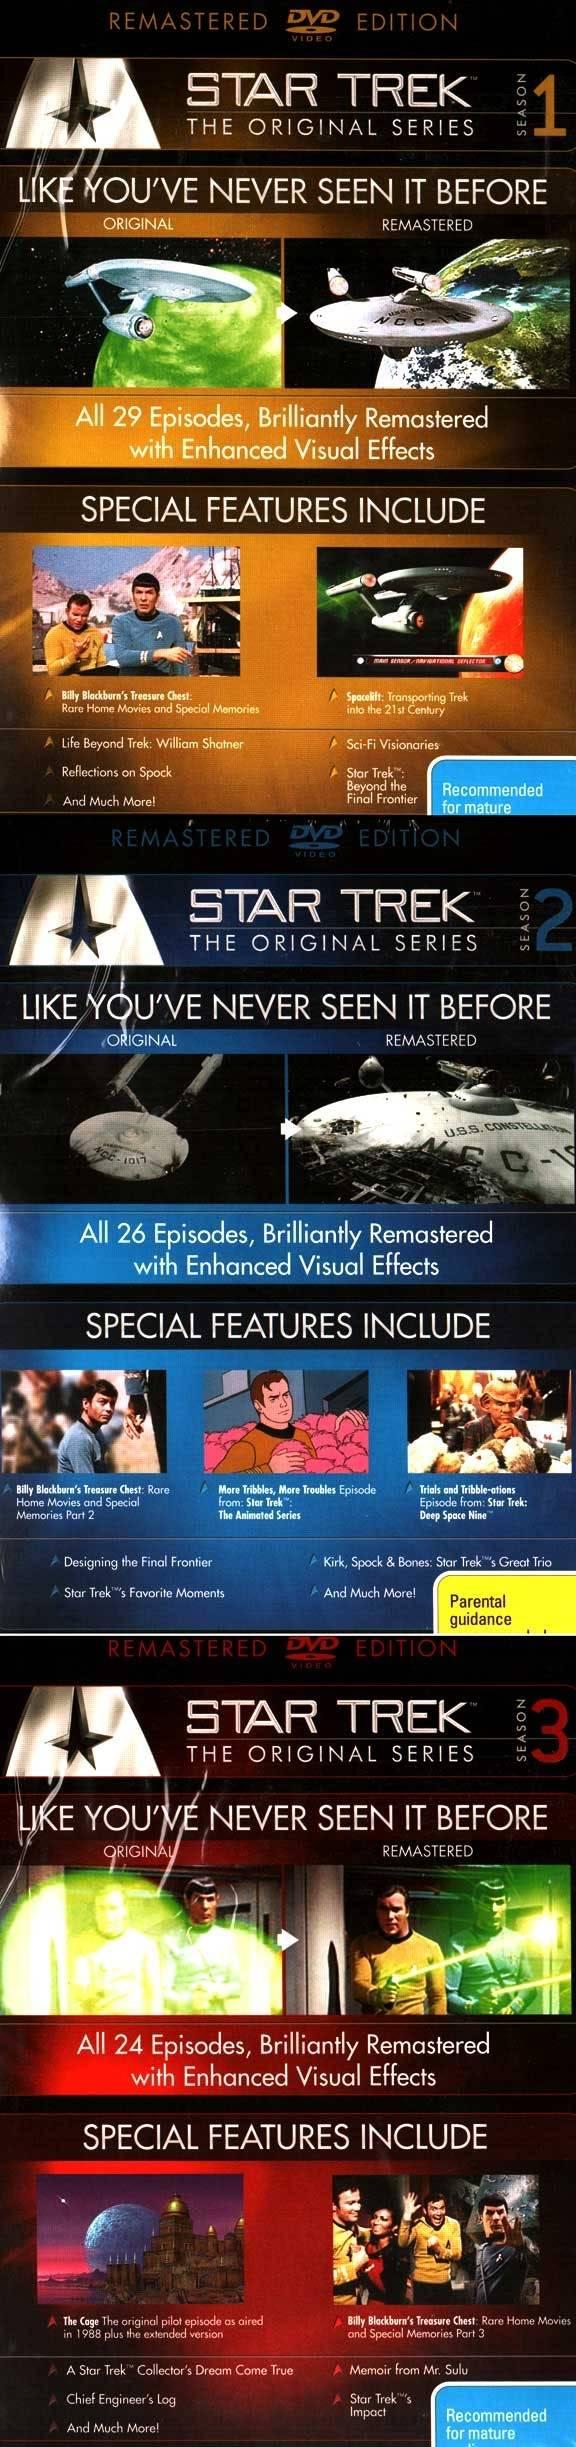 Les coffrets DVD/BluRay remasterisés - Page 8 Stos-1